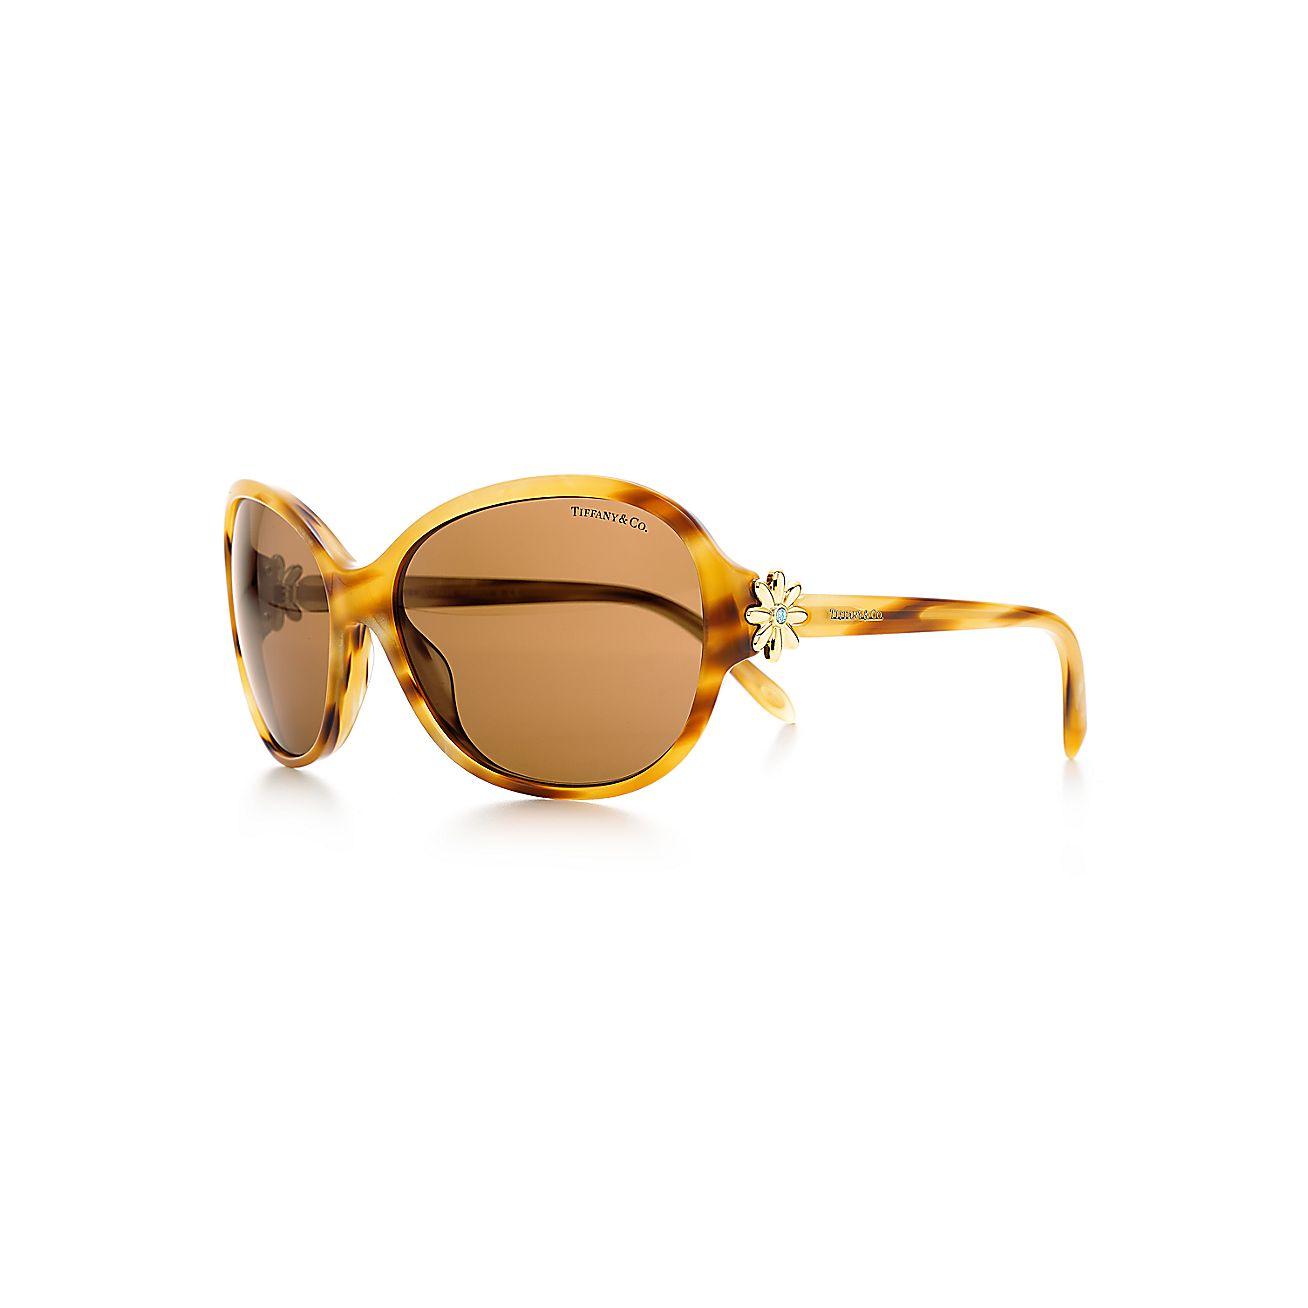 Tiffany Garden:Round Sunglasses